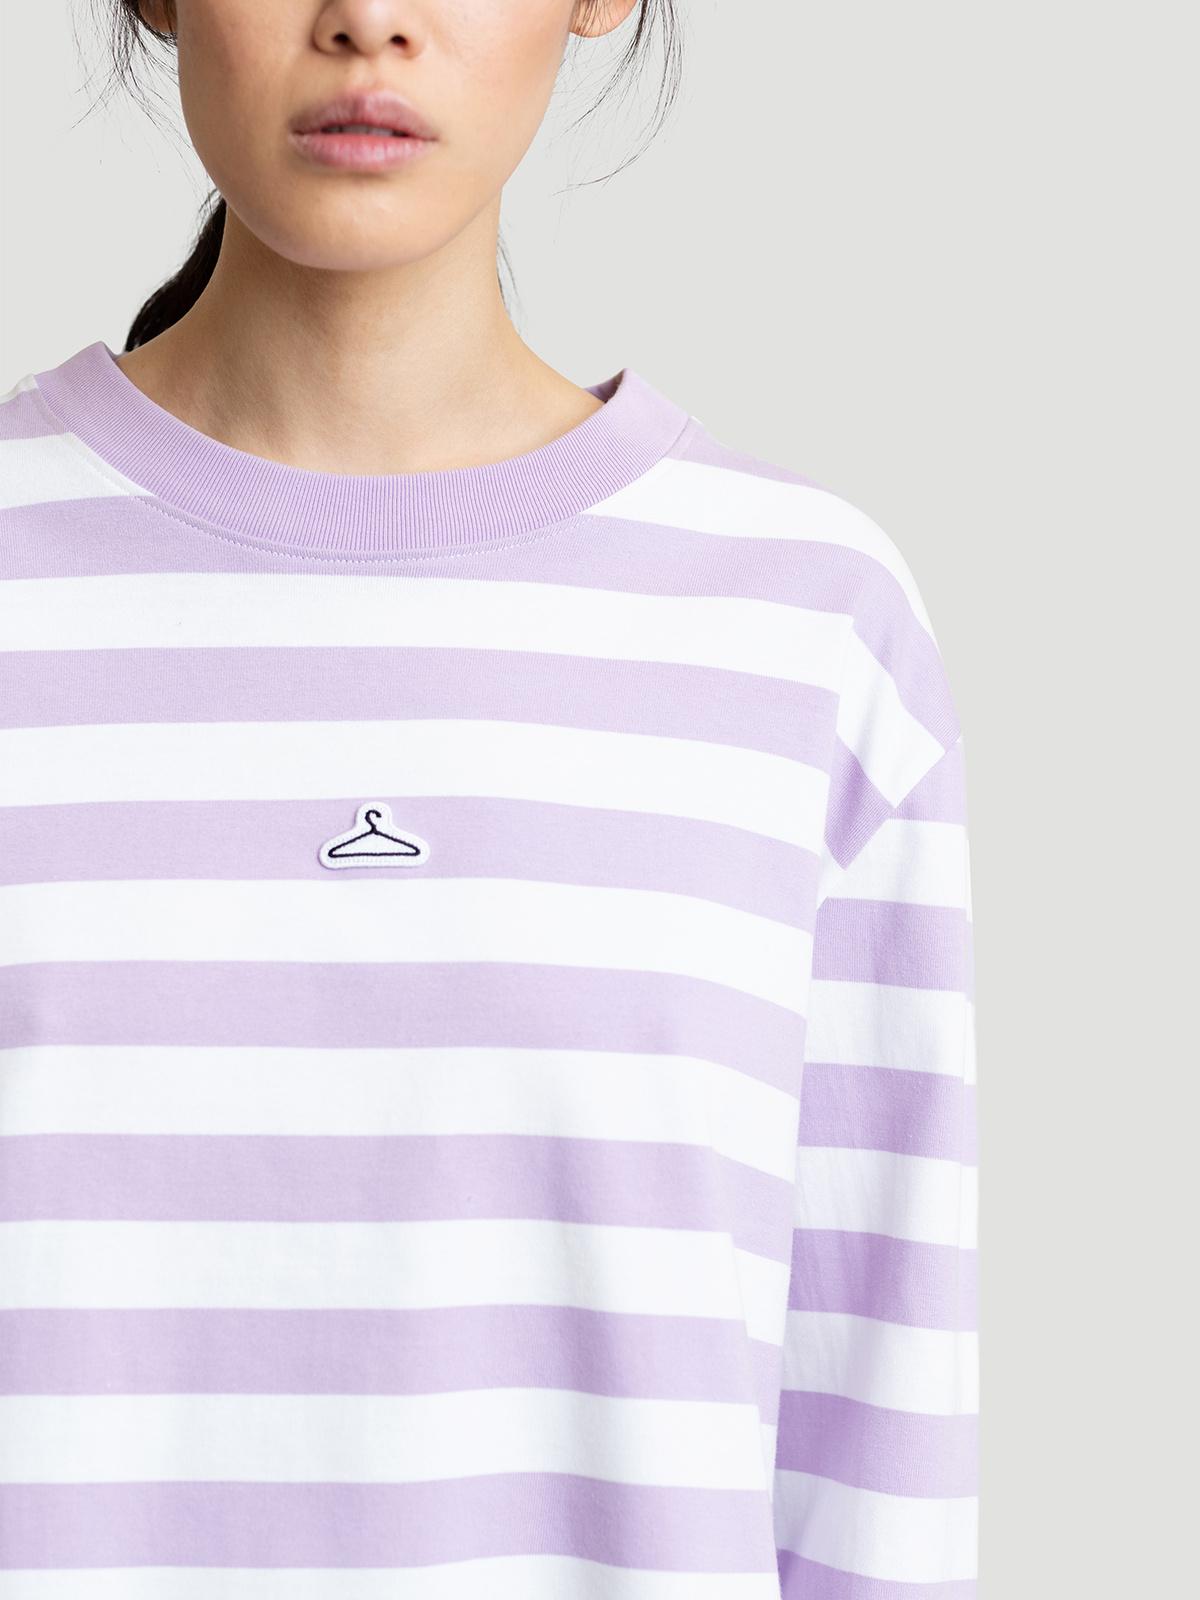 Hanger Striped Longsleeve Lilac White 4